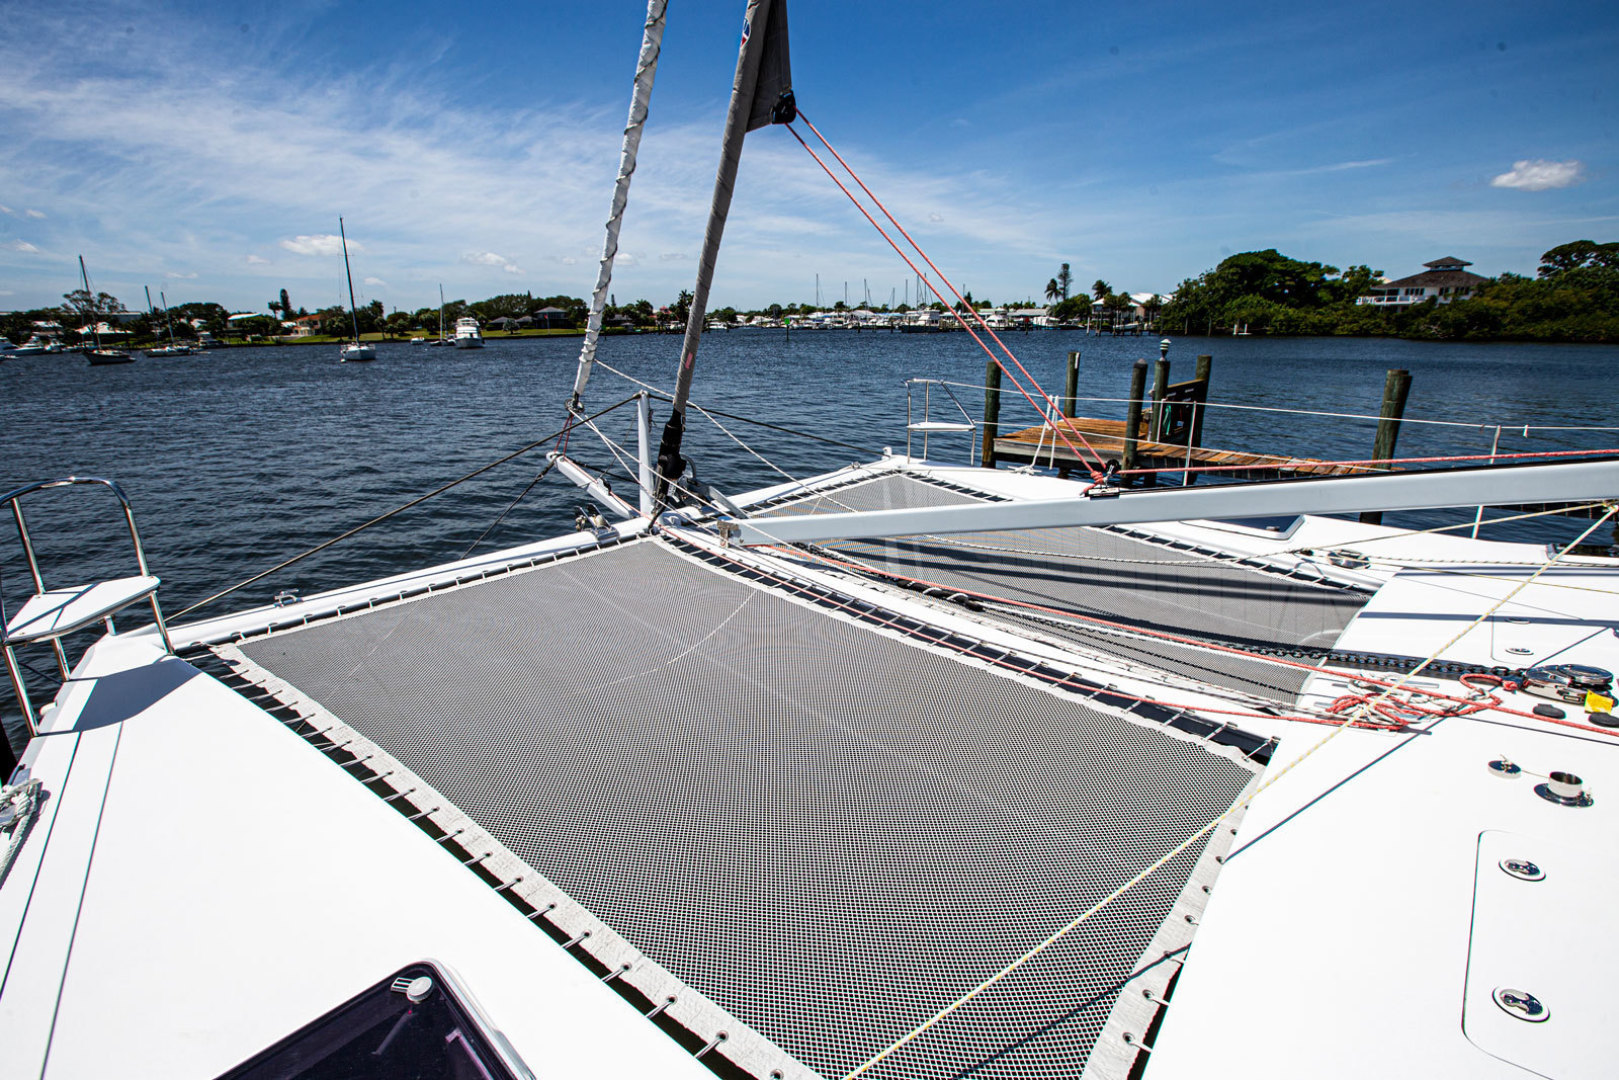 Atlantic-49 Catamaran 2018-Wabi Sabi Stuart-Florida-United States-1399300 | Thumbnail